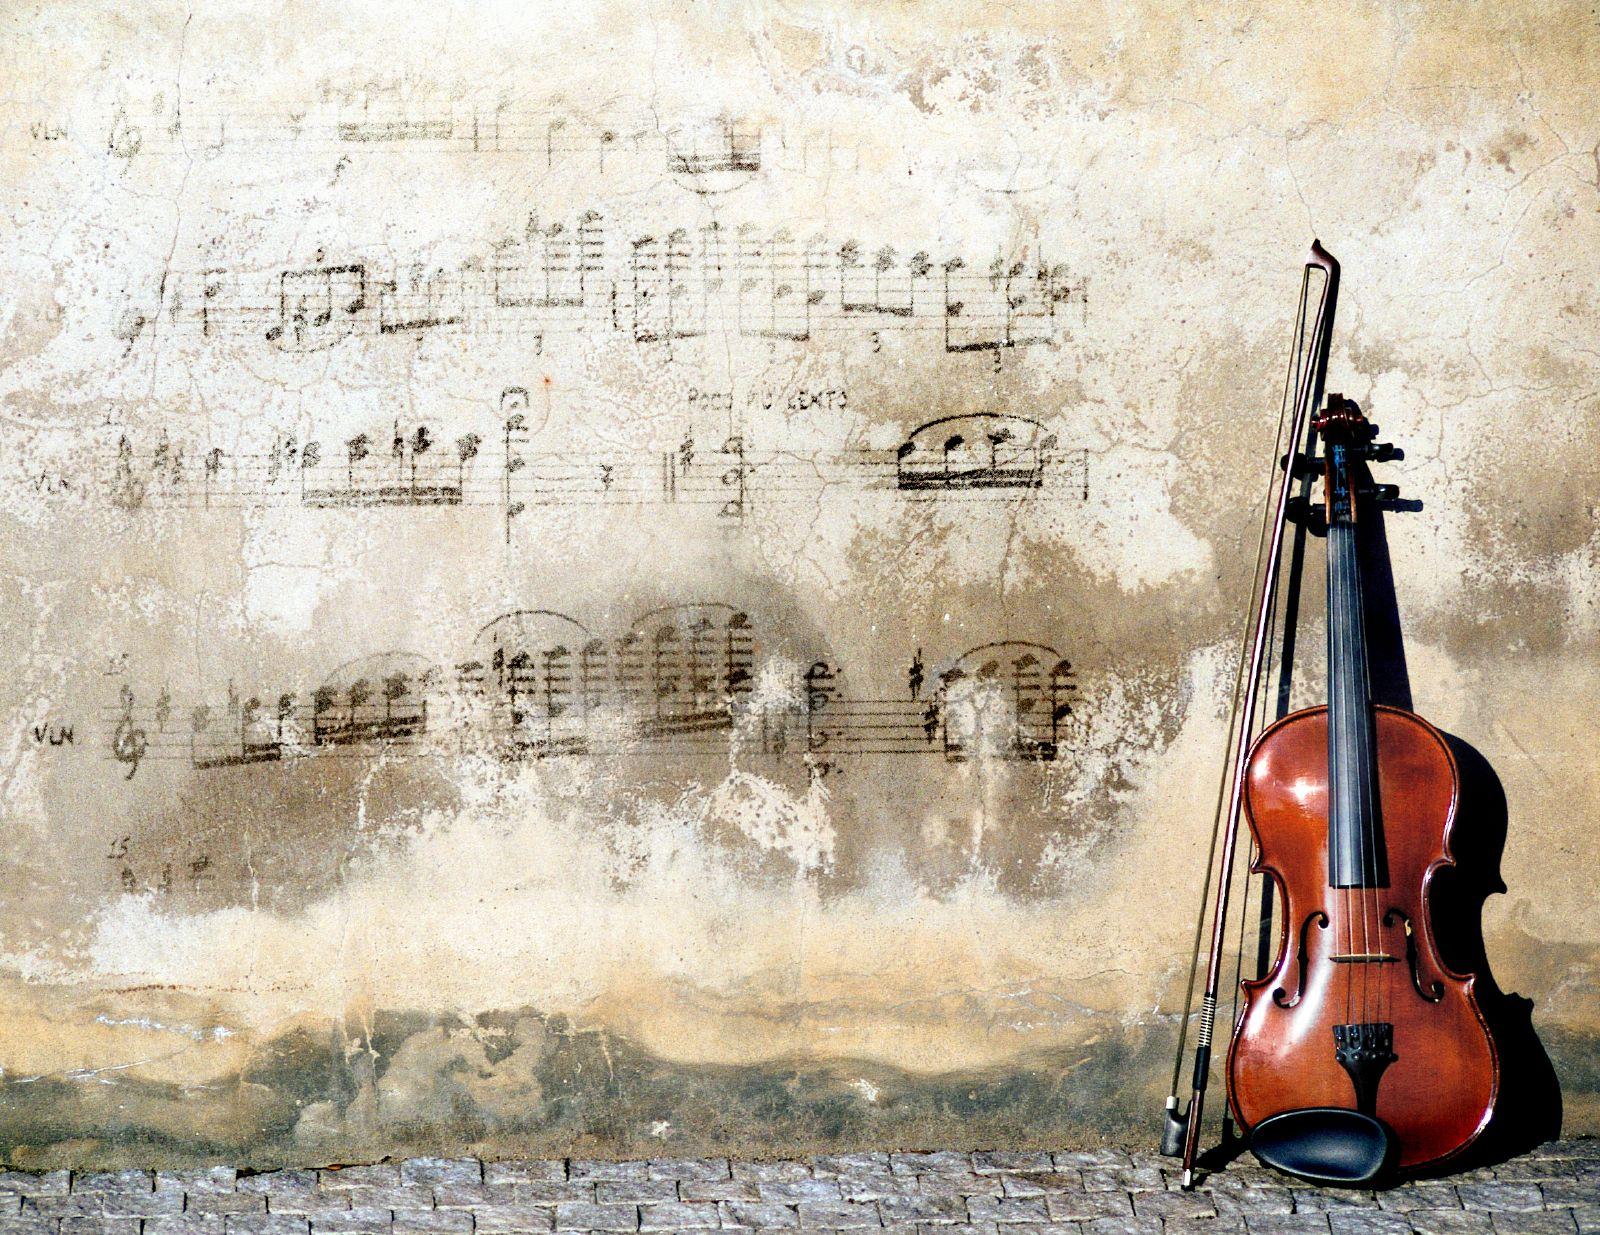 Wallpaper : street, old, music, wall, digital, manipulated, dirty